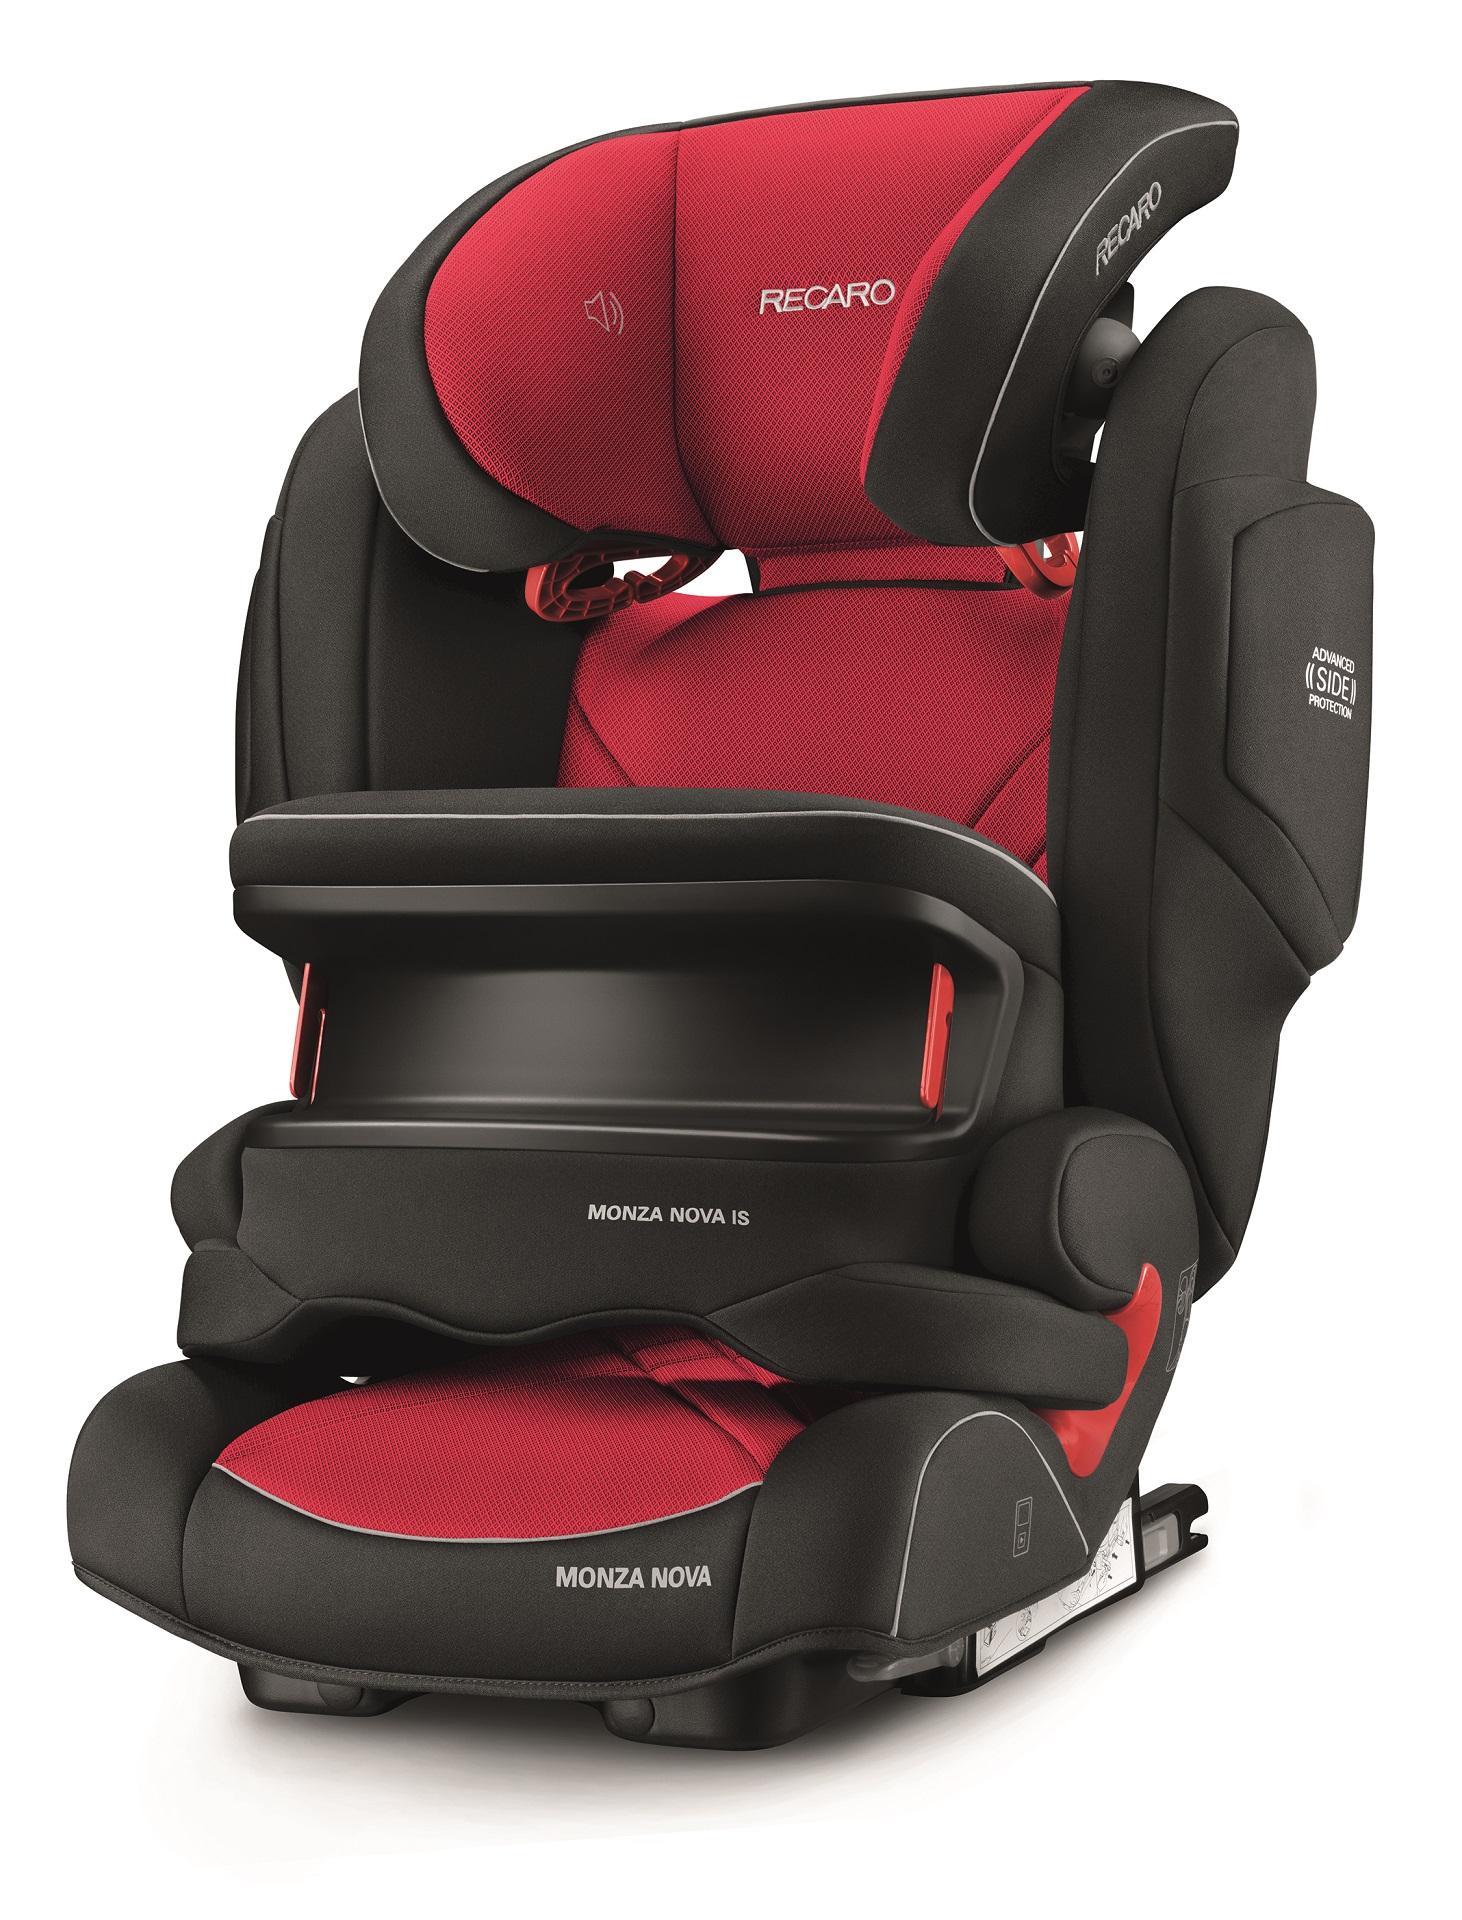 Recaro Child Car Sear Monza Nova IS Seatfix 2018 Racing Red - Buy at